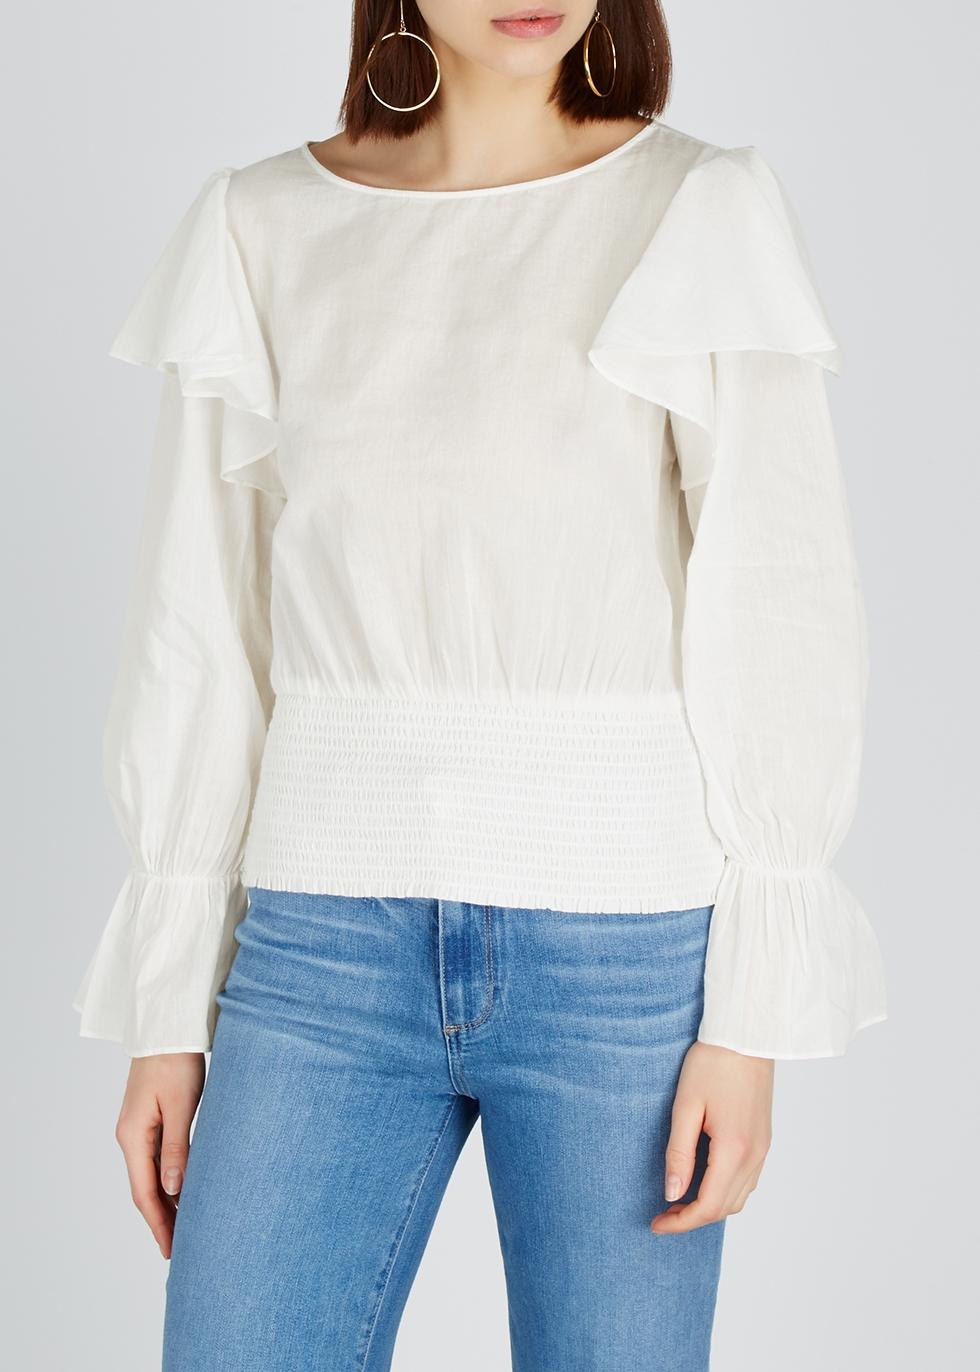 Laya white ruffled cotton top - Alice + Olivia